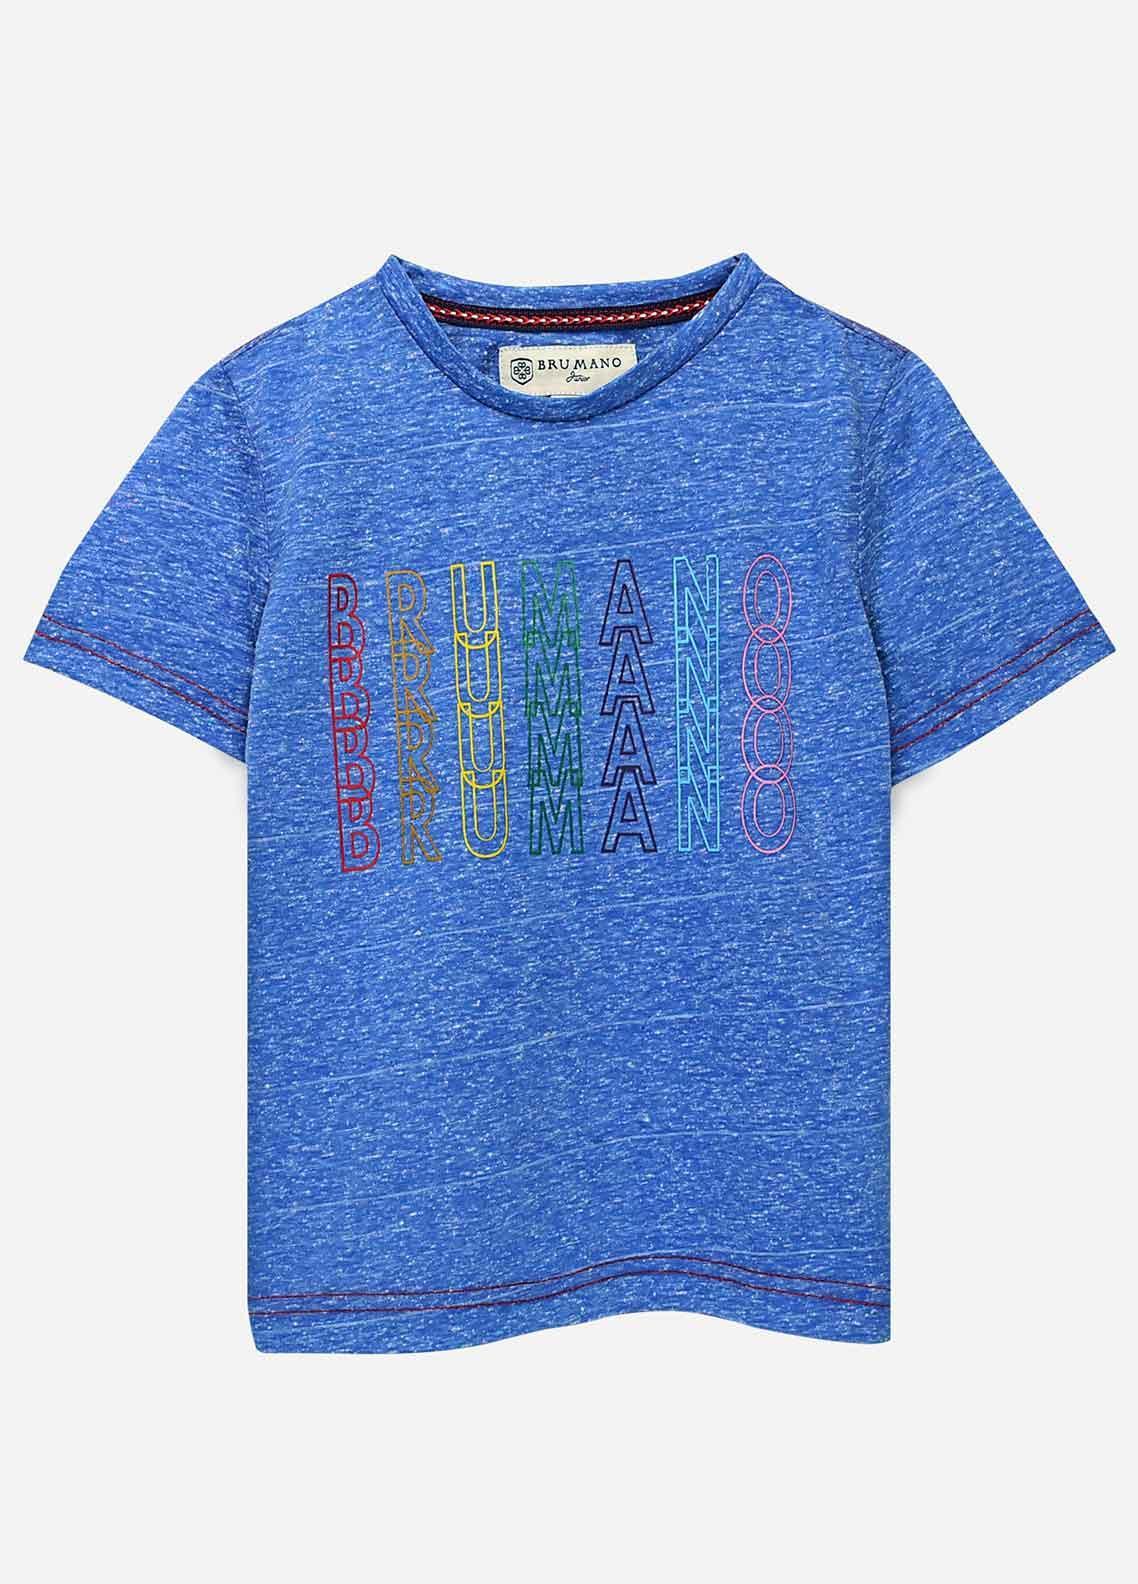 Brumano Cotton Casual Boys T-Shirts -  BRM21JS Blue Printed